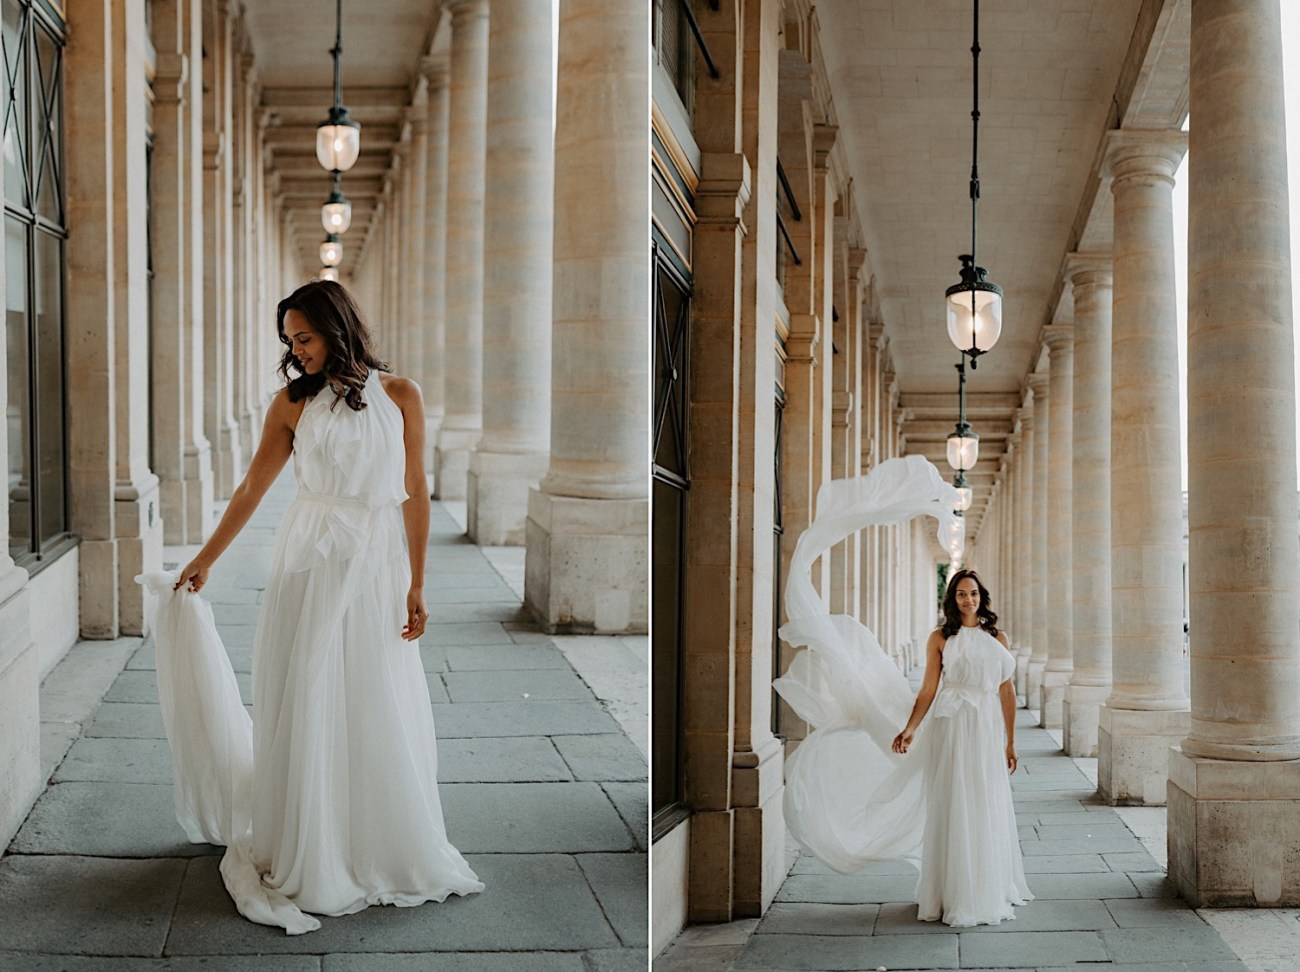 Paris Louvre Wedding Photos Paris Wedding Photographer Destination Wedding France Anais Possamai Photography 03